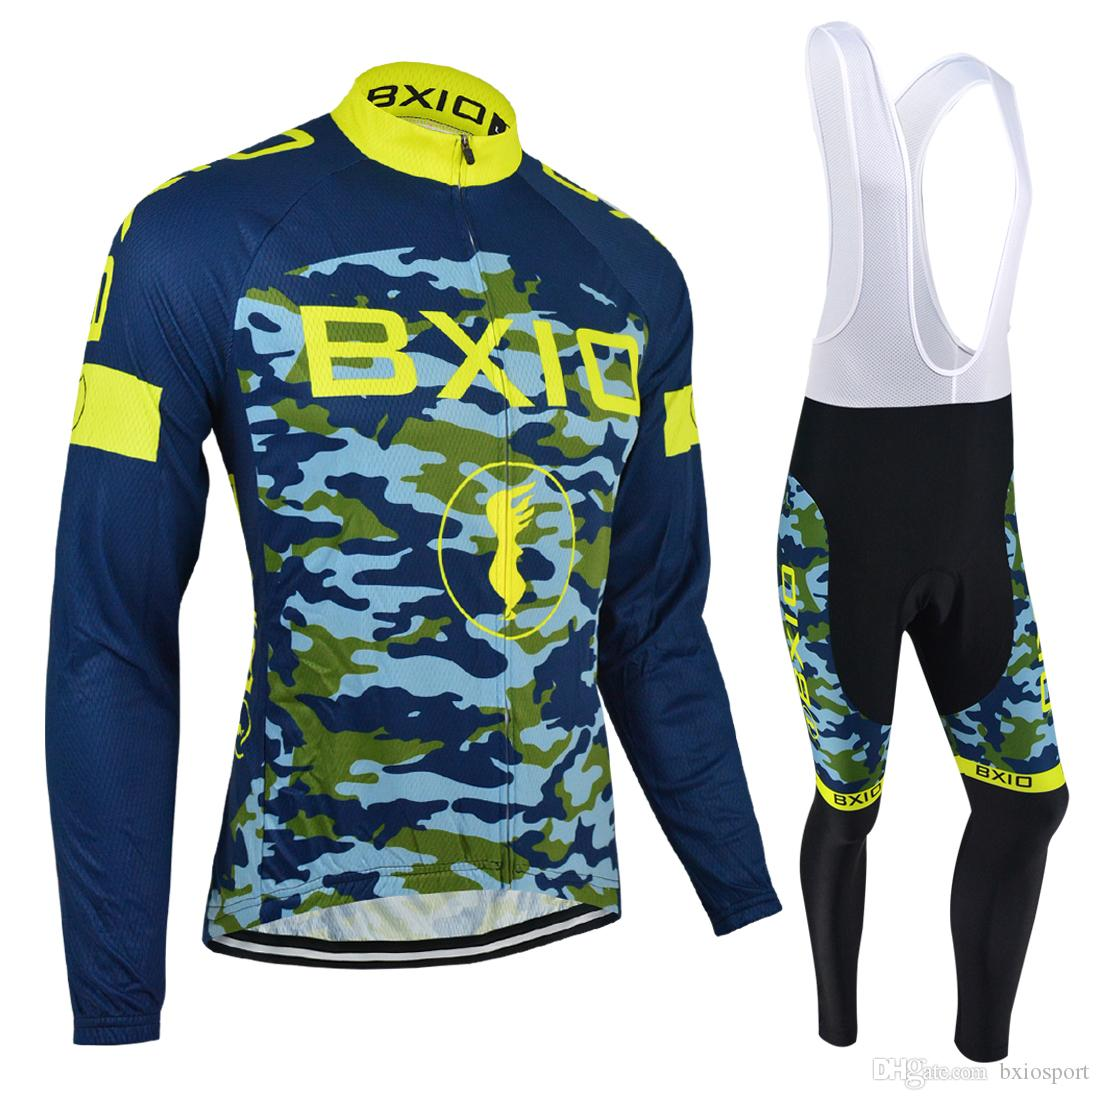 2bda59021 BXIO Brand Cycling Jerseys Men Long Sleeve Winter And Autumn Bicycle ...